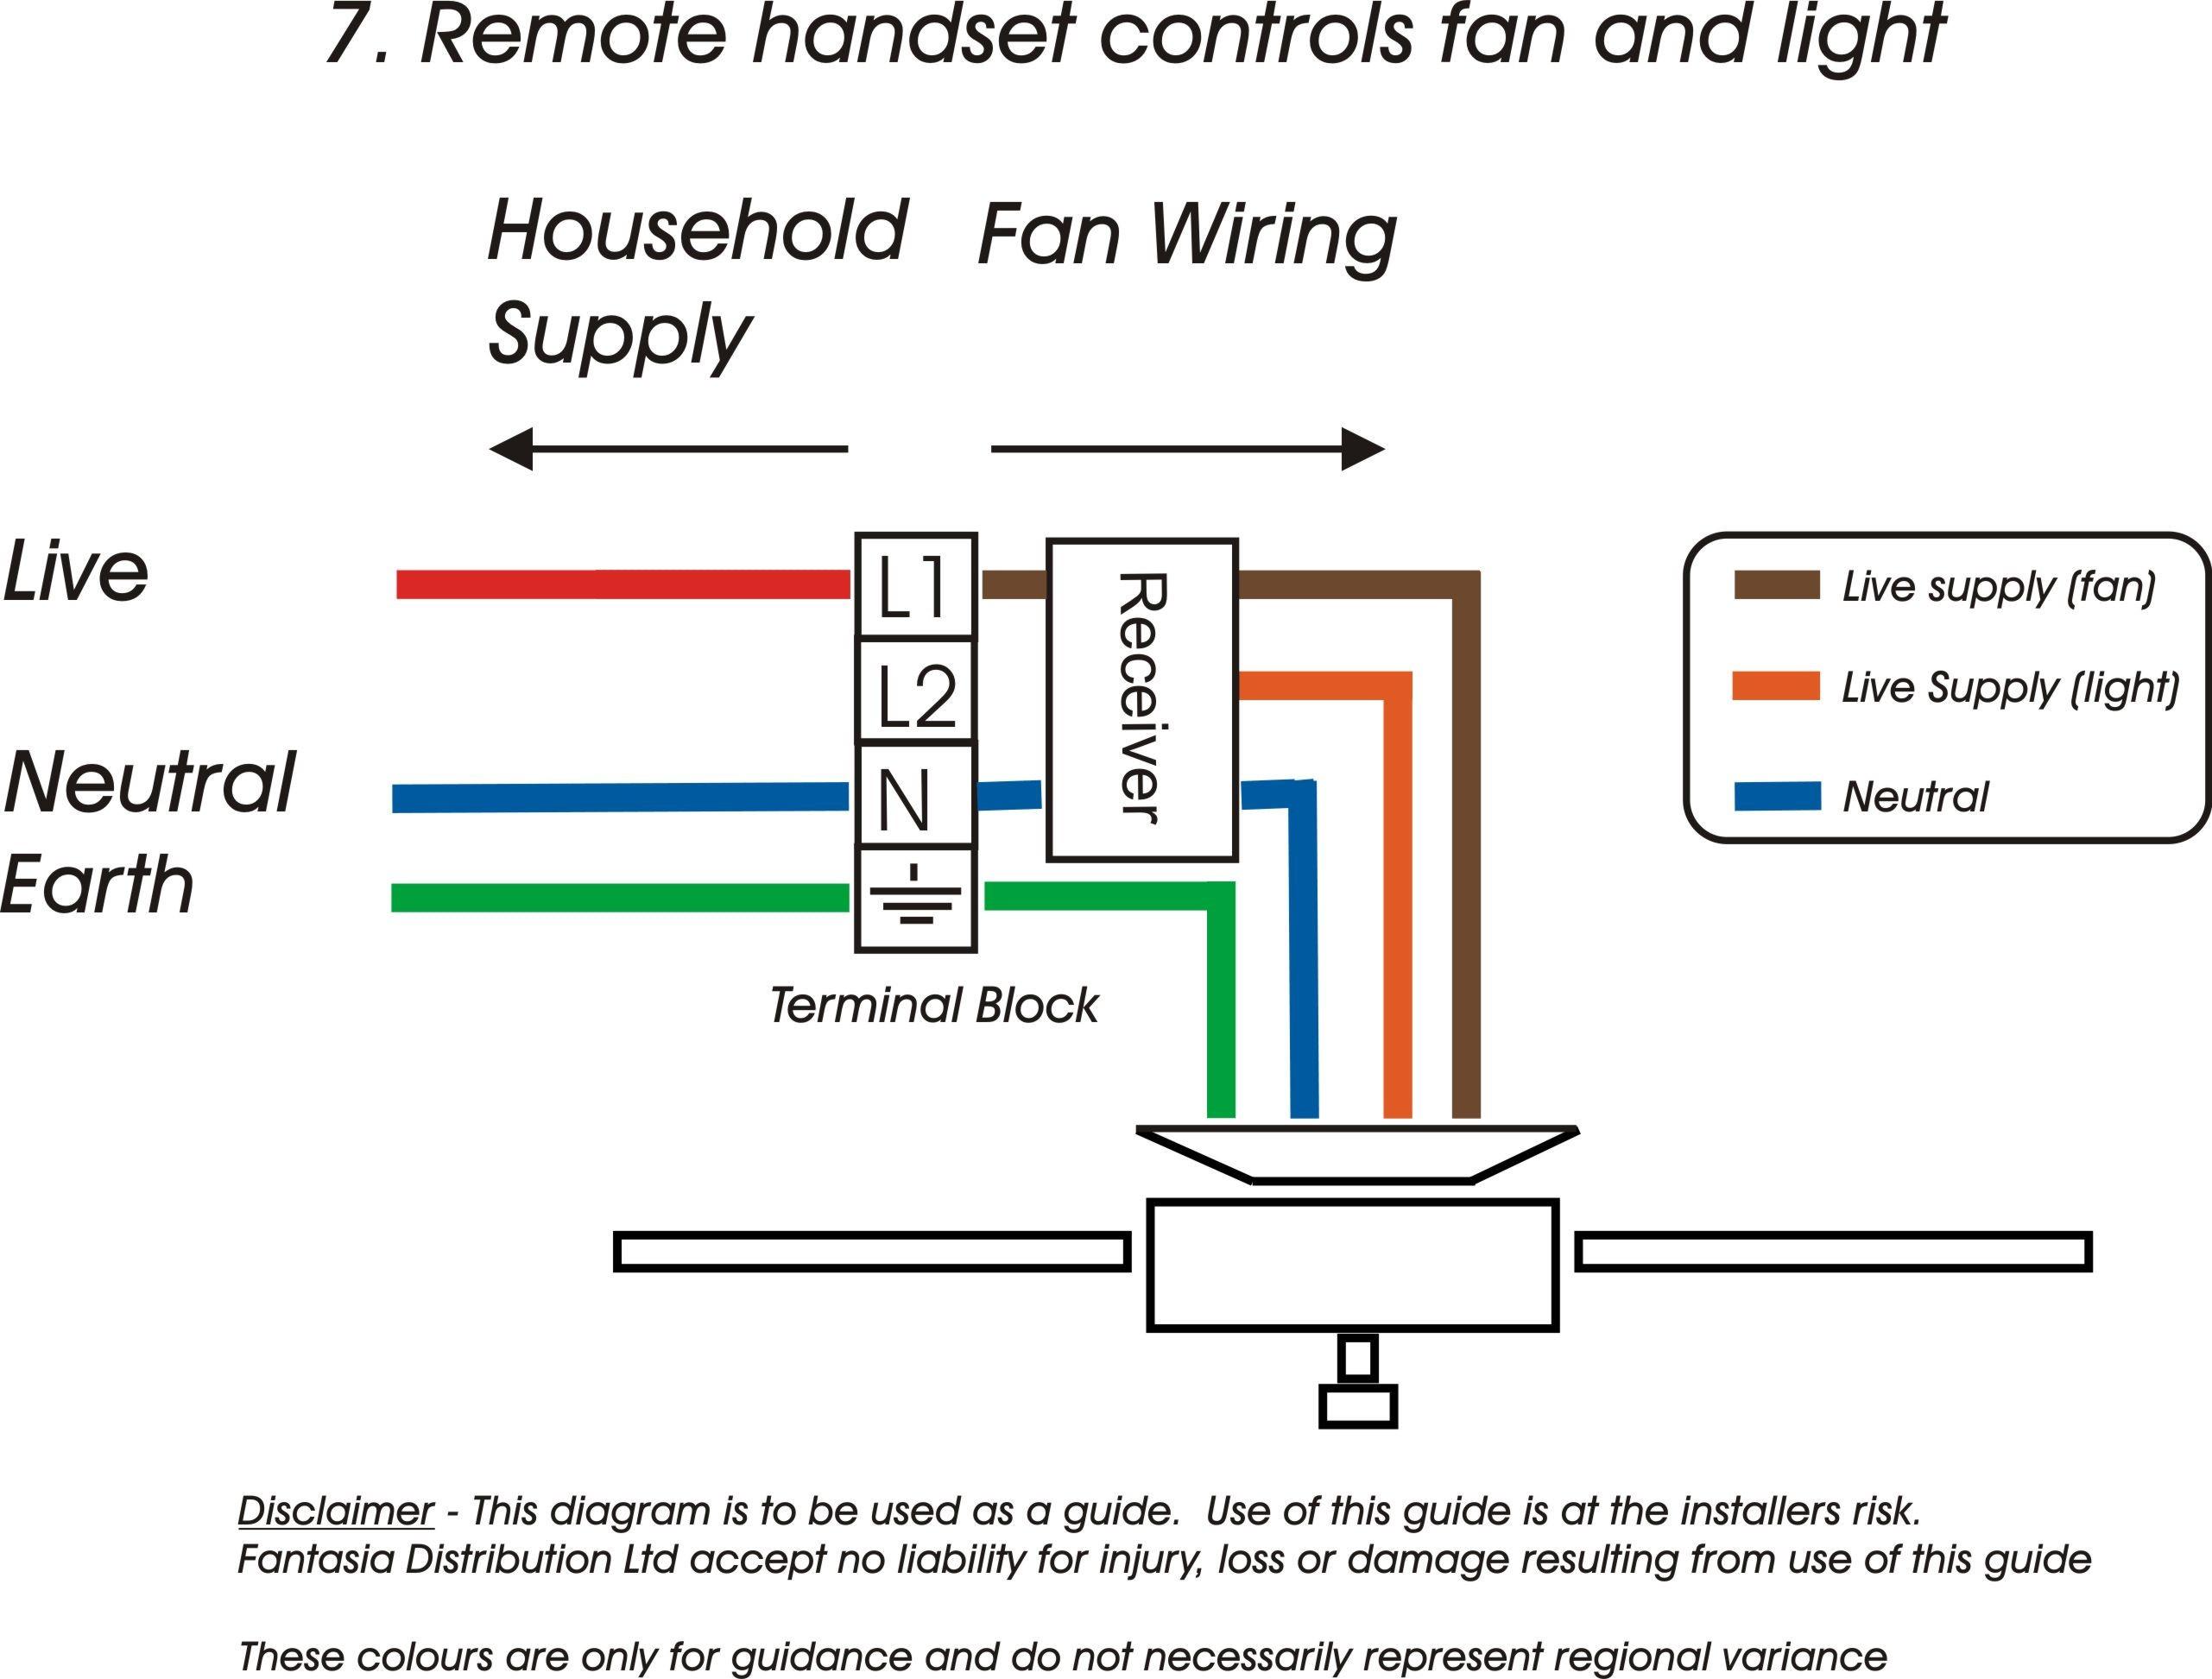 ceiling fan wiring diagram gt 6540  wiring diagram hampton bay ceiling fan light schematic wiring ceiling fan wiring diagram blue wire wiring diagram hampton bay ceiling fan